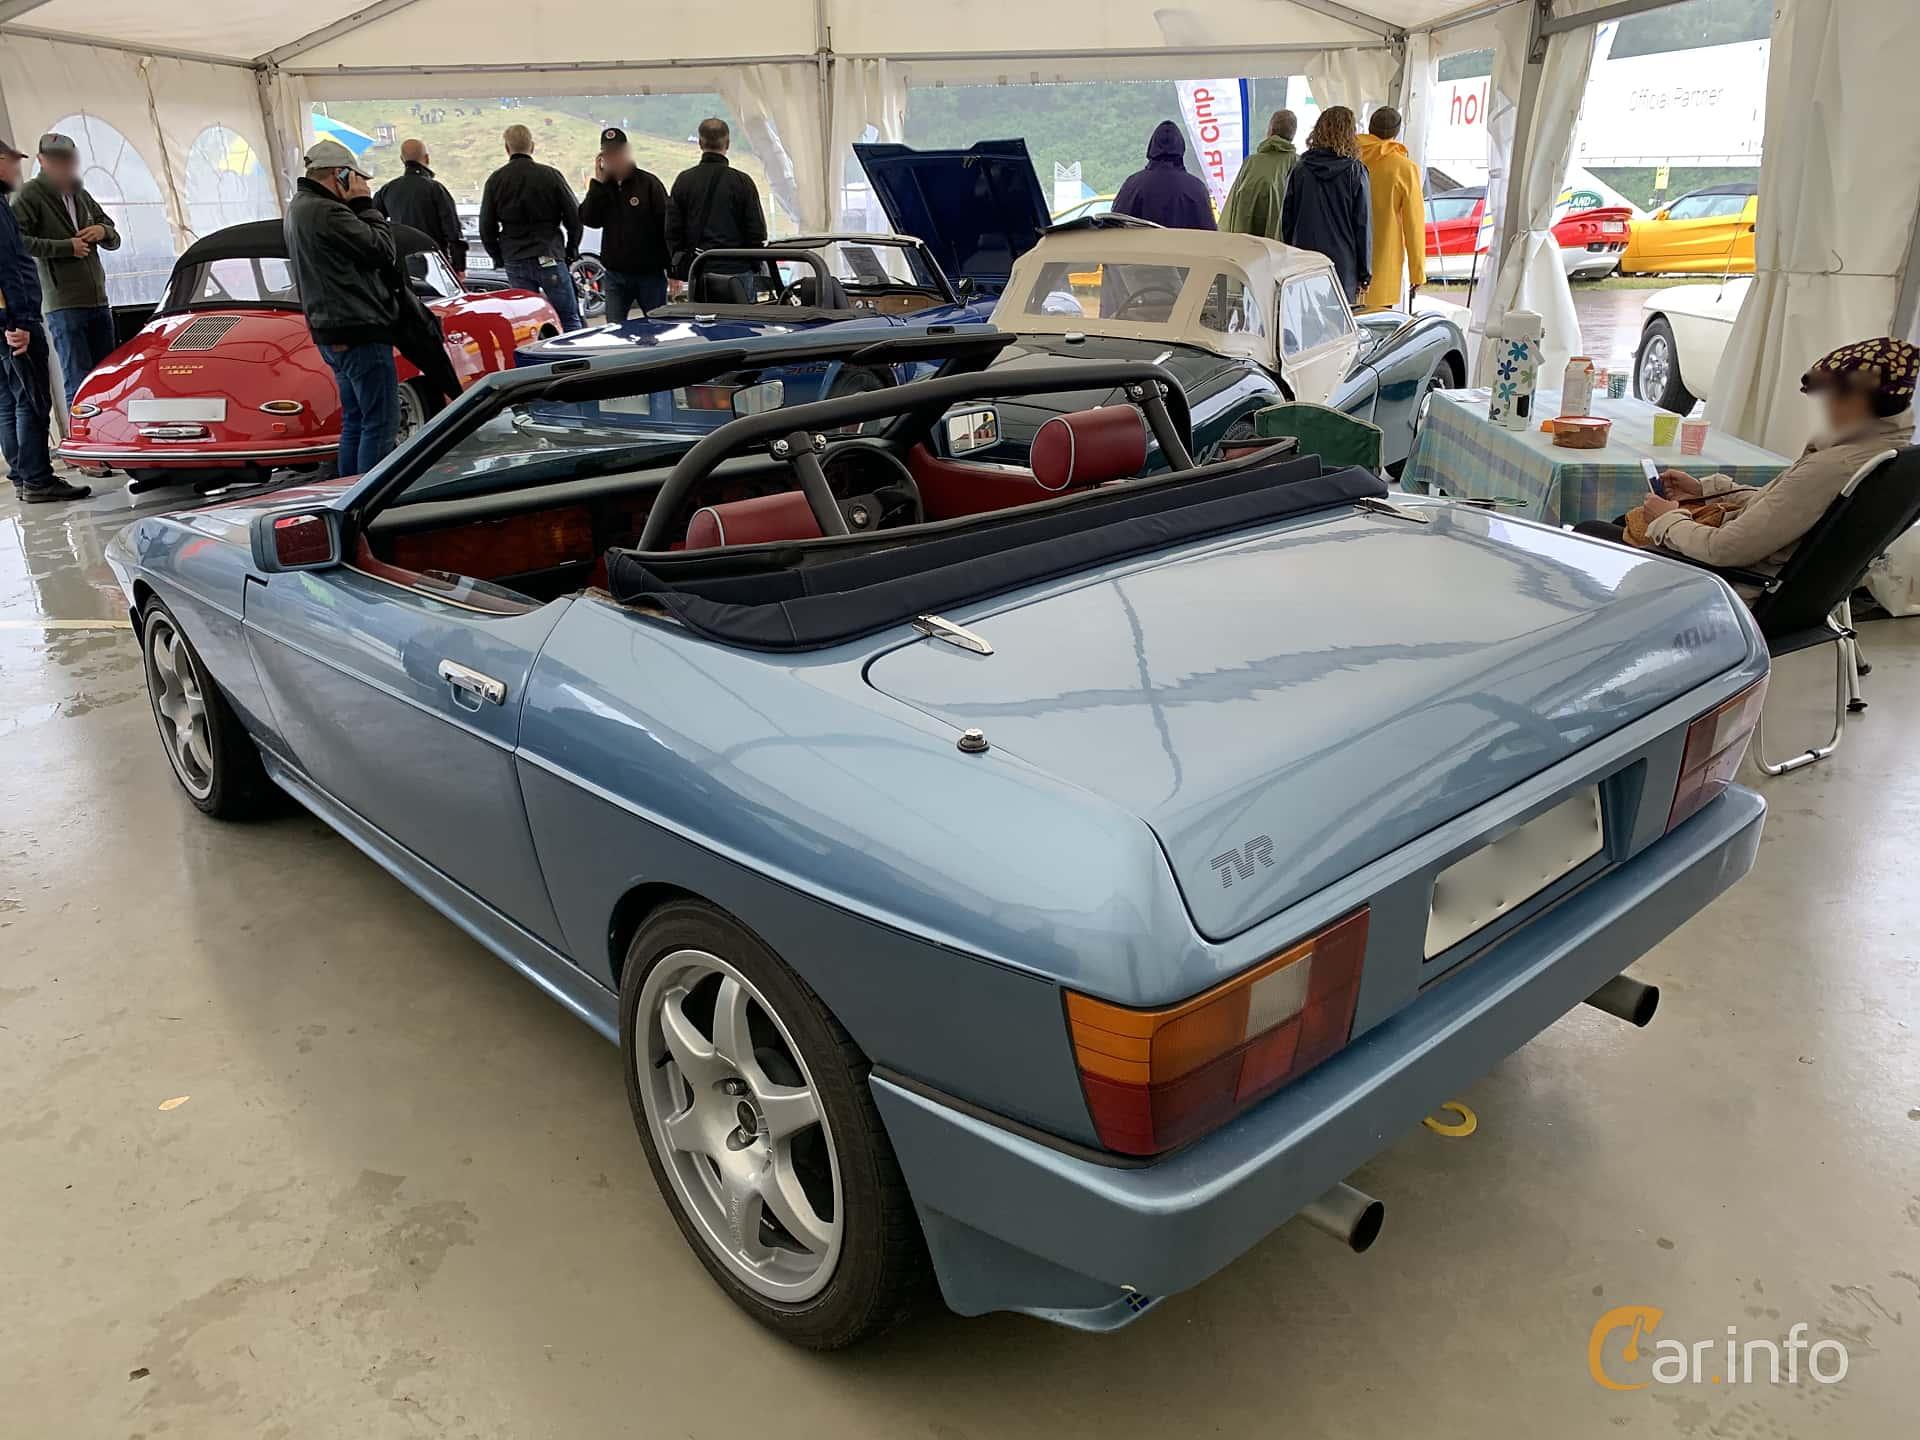 TVR 350i Convertible 3.5 V8 Manual, 193hp, 1985 at Svenskt sportvagnsmeeting 2019